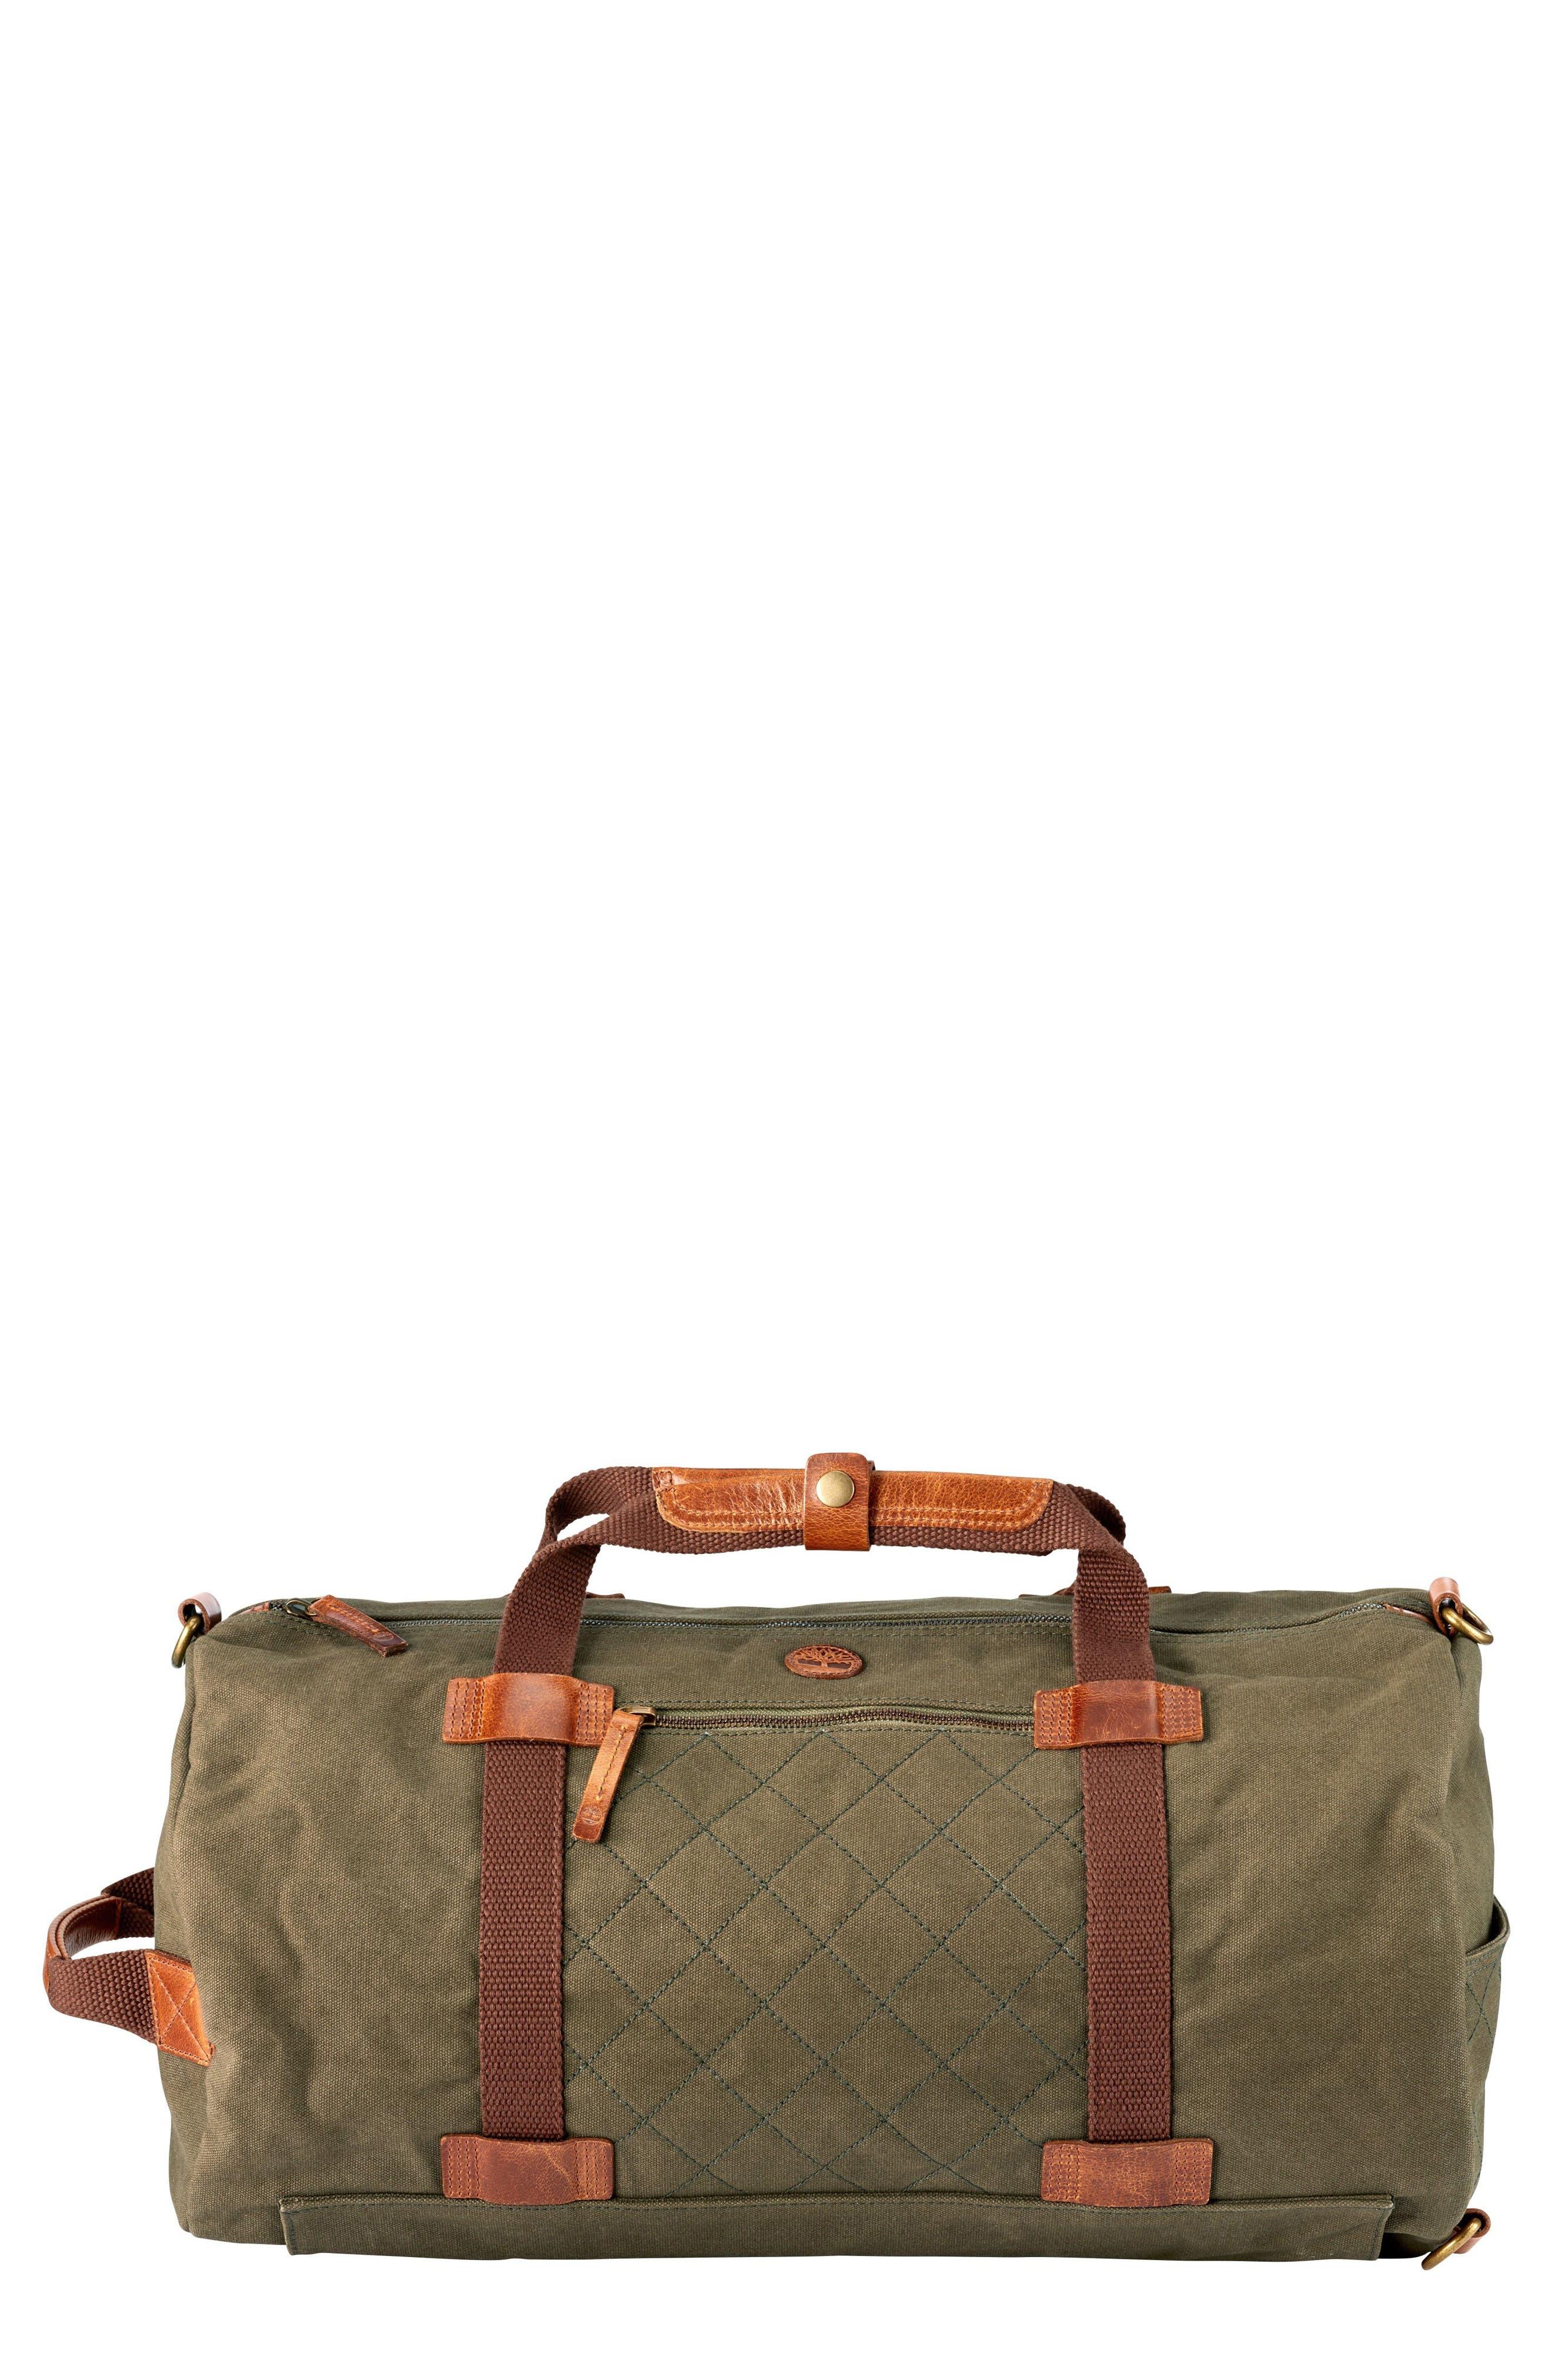 Nantasket Duffel Bag,                             Main thumbnail 1, color,                             335